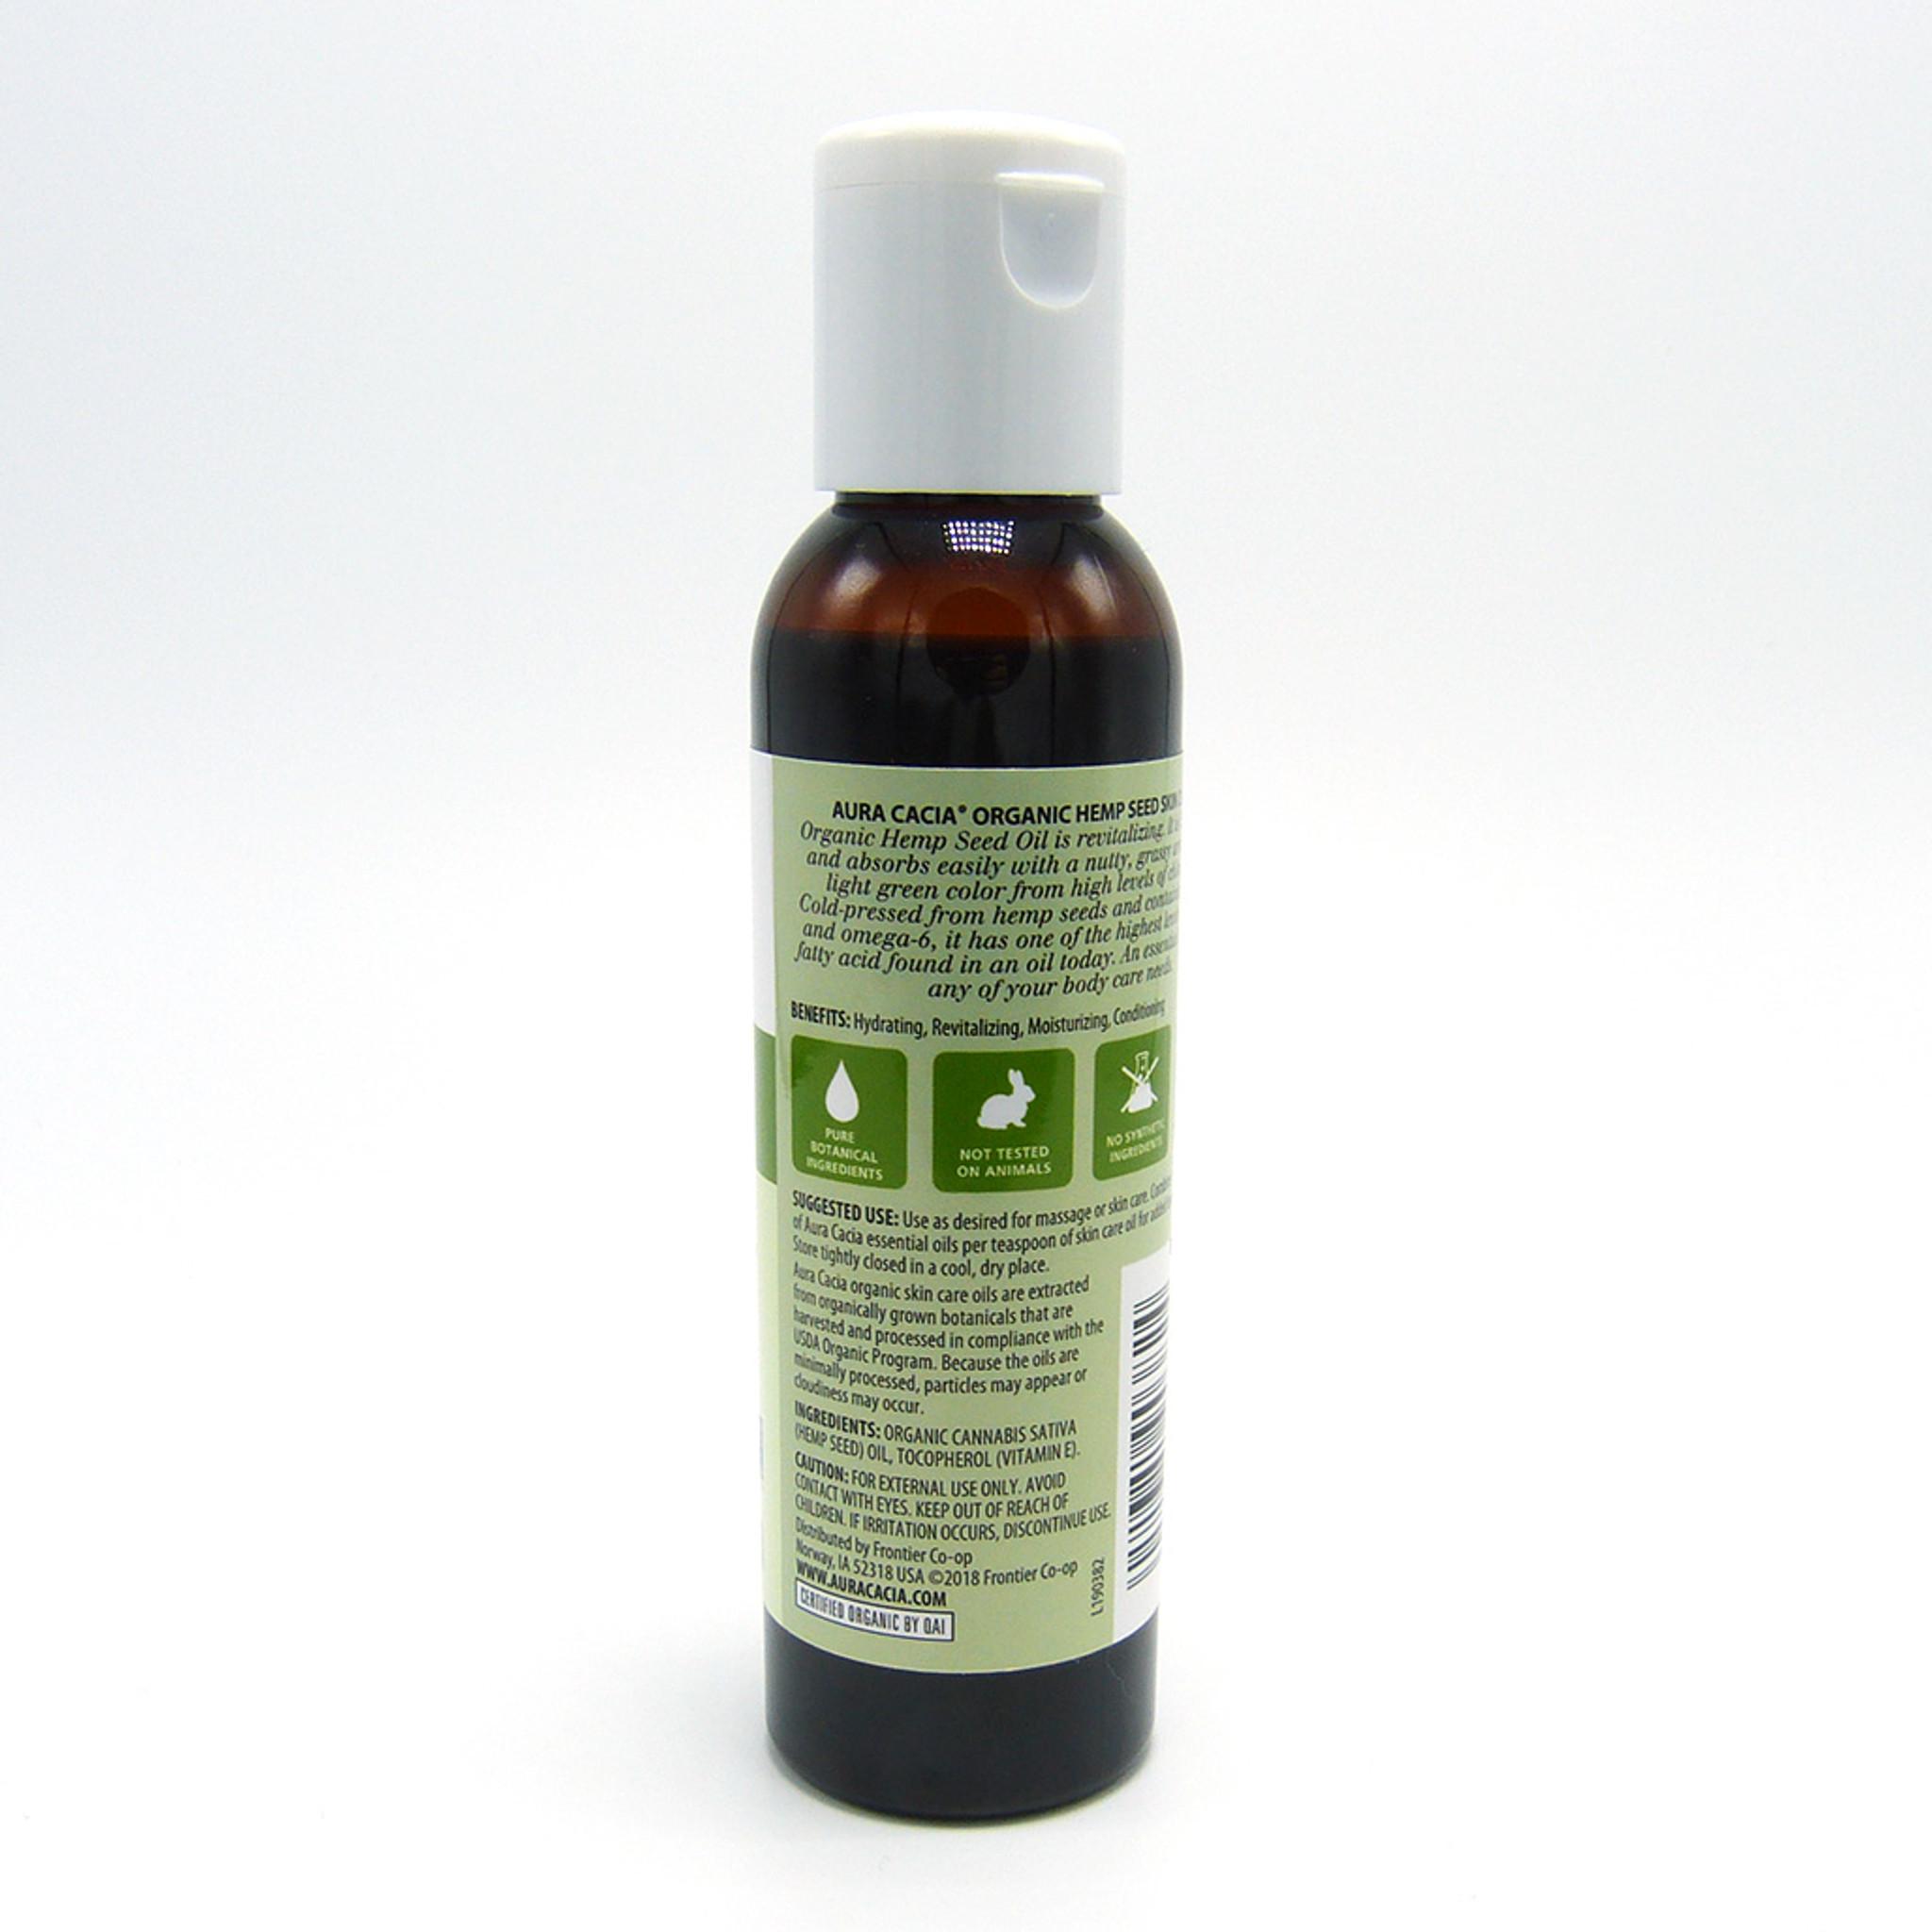 Aura Cacia Organic Hemp Seed Skin Care Oil Hemp Headquarters